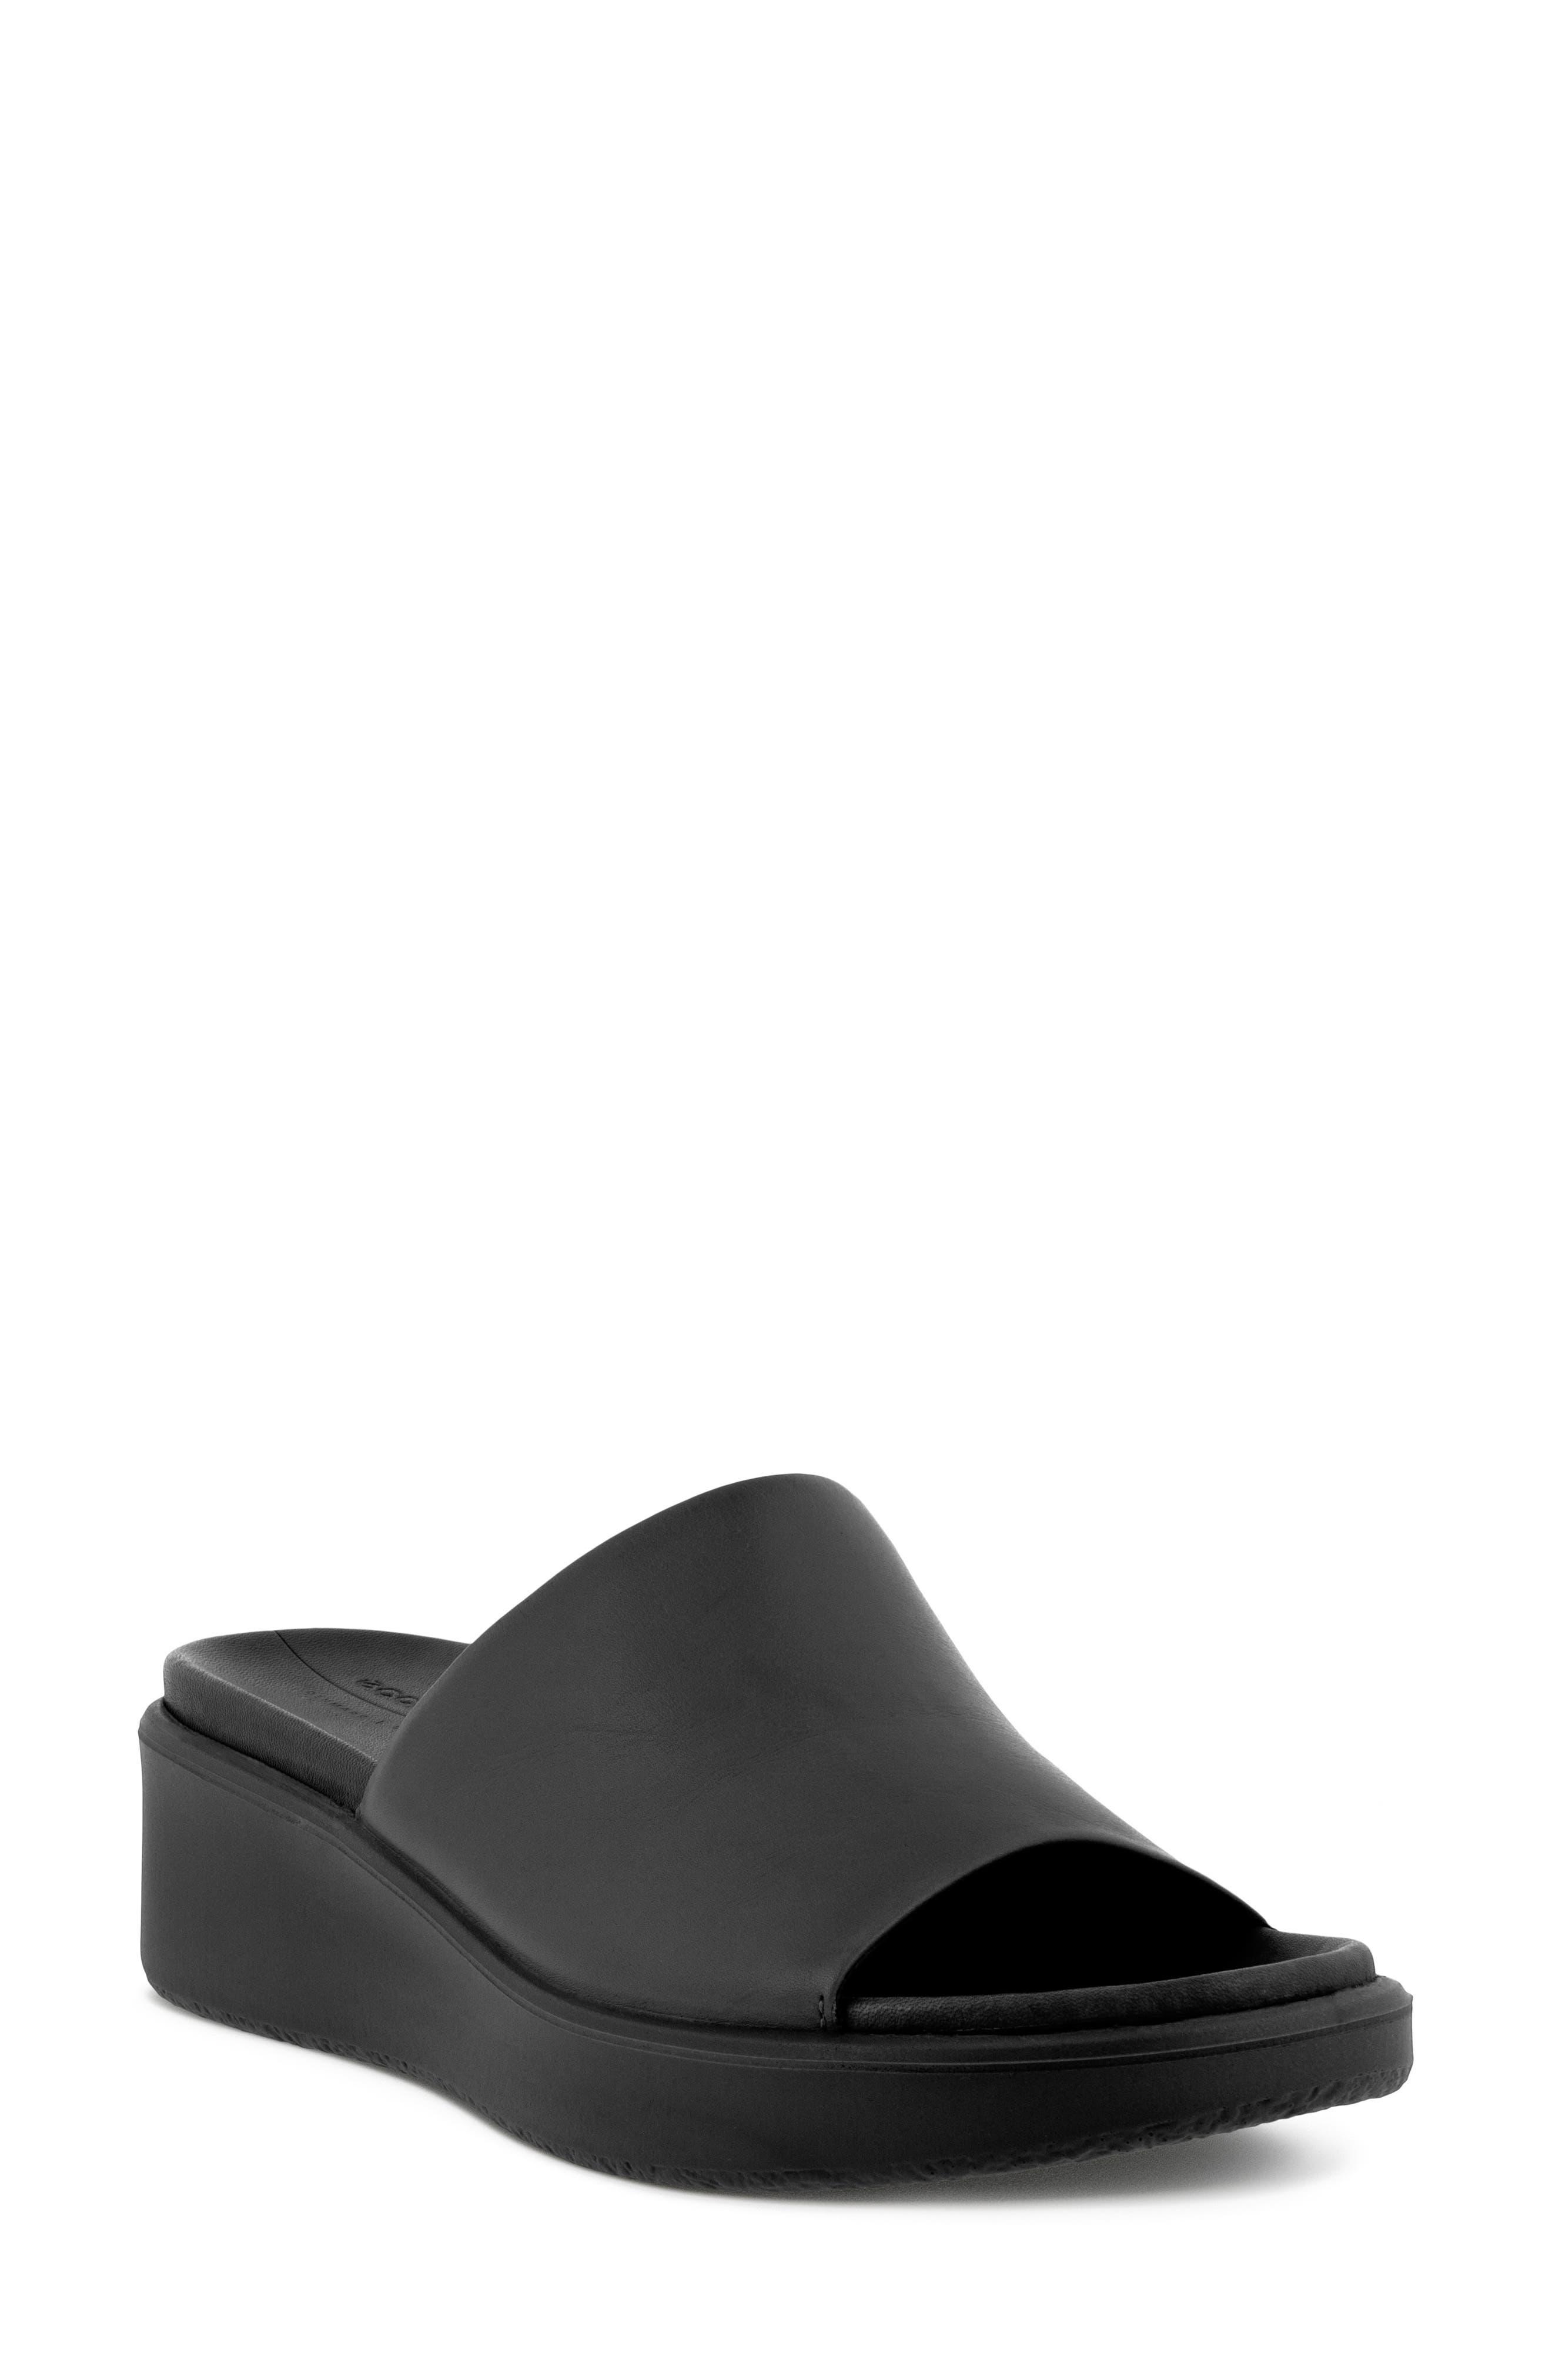 Women's Ecco Flowt Wedge Slide Sandal